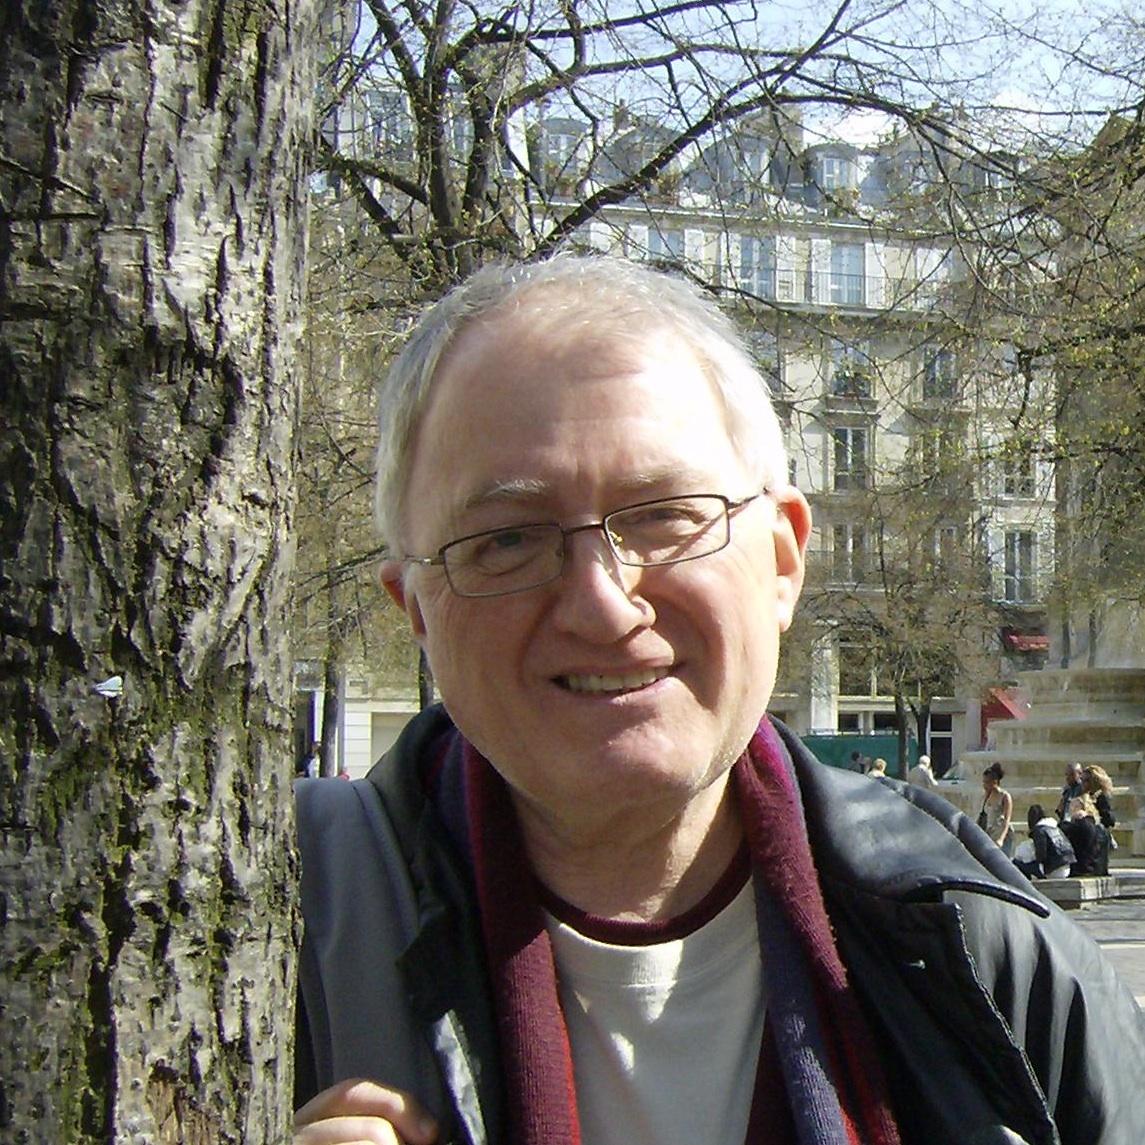 Jean-Claude Crivelli